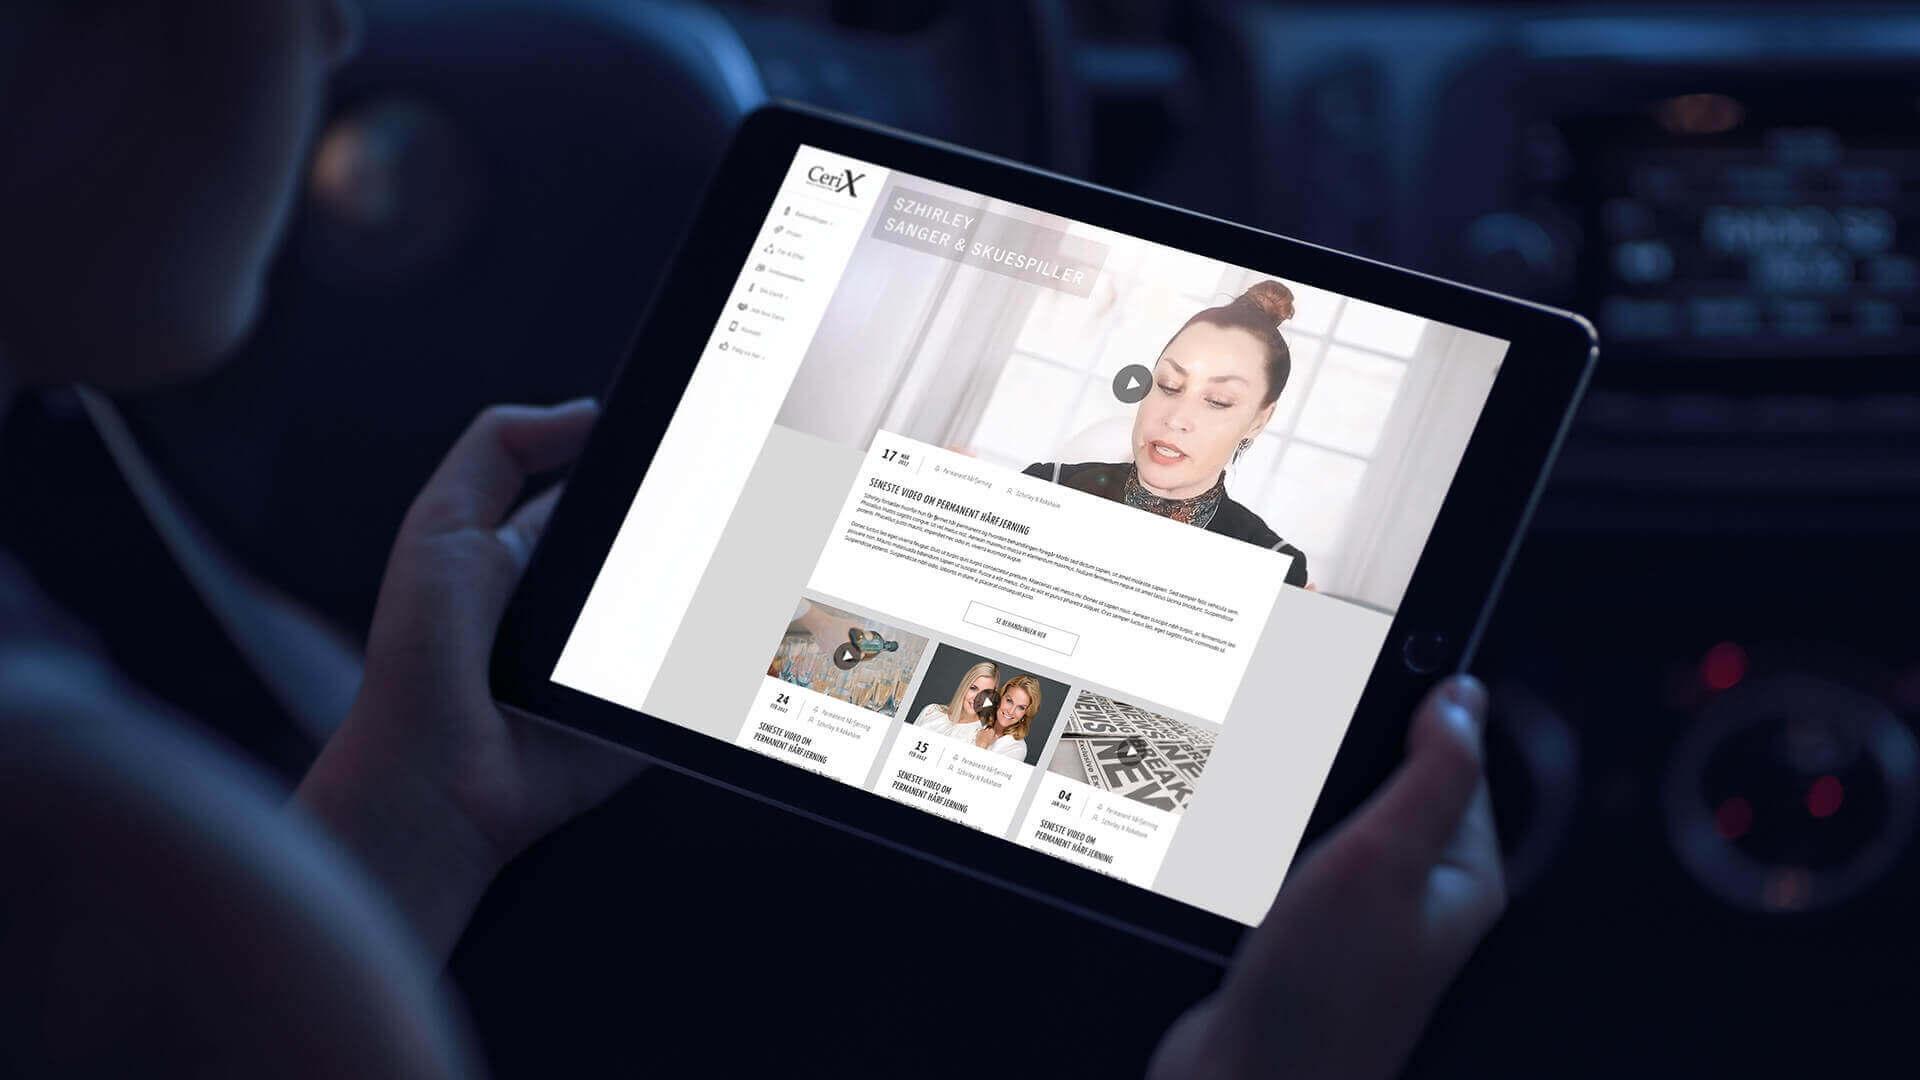 CeriX præsentation på iPad